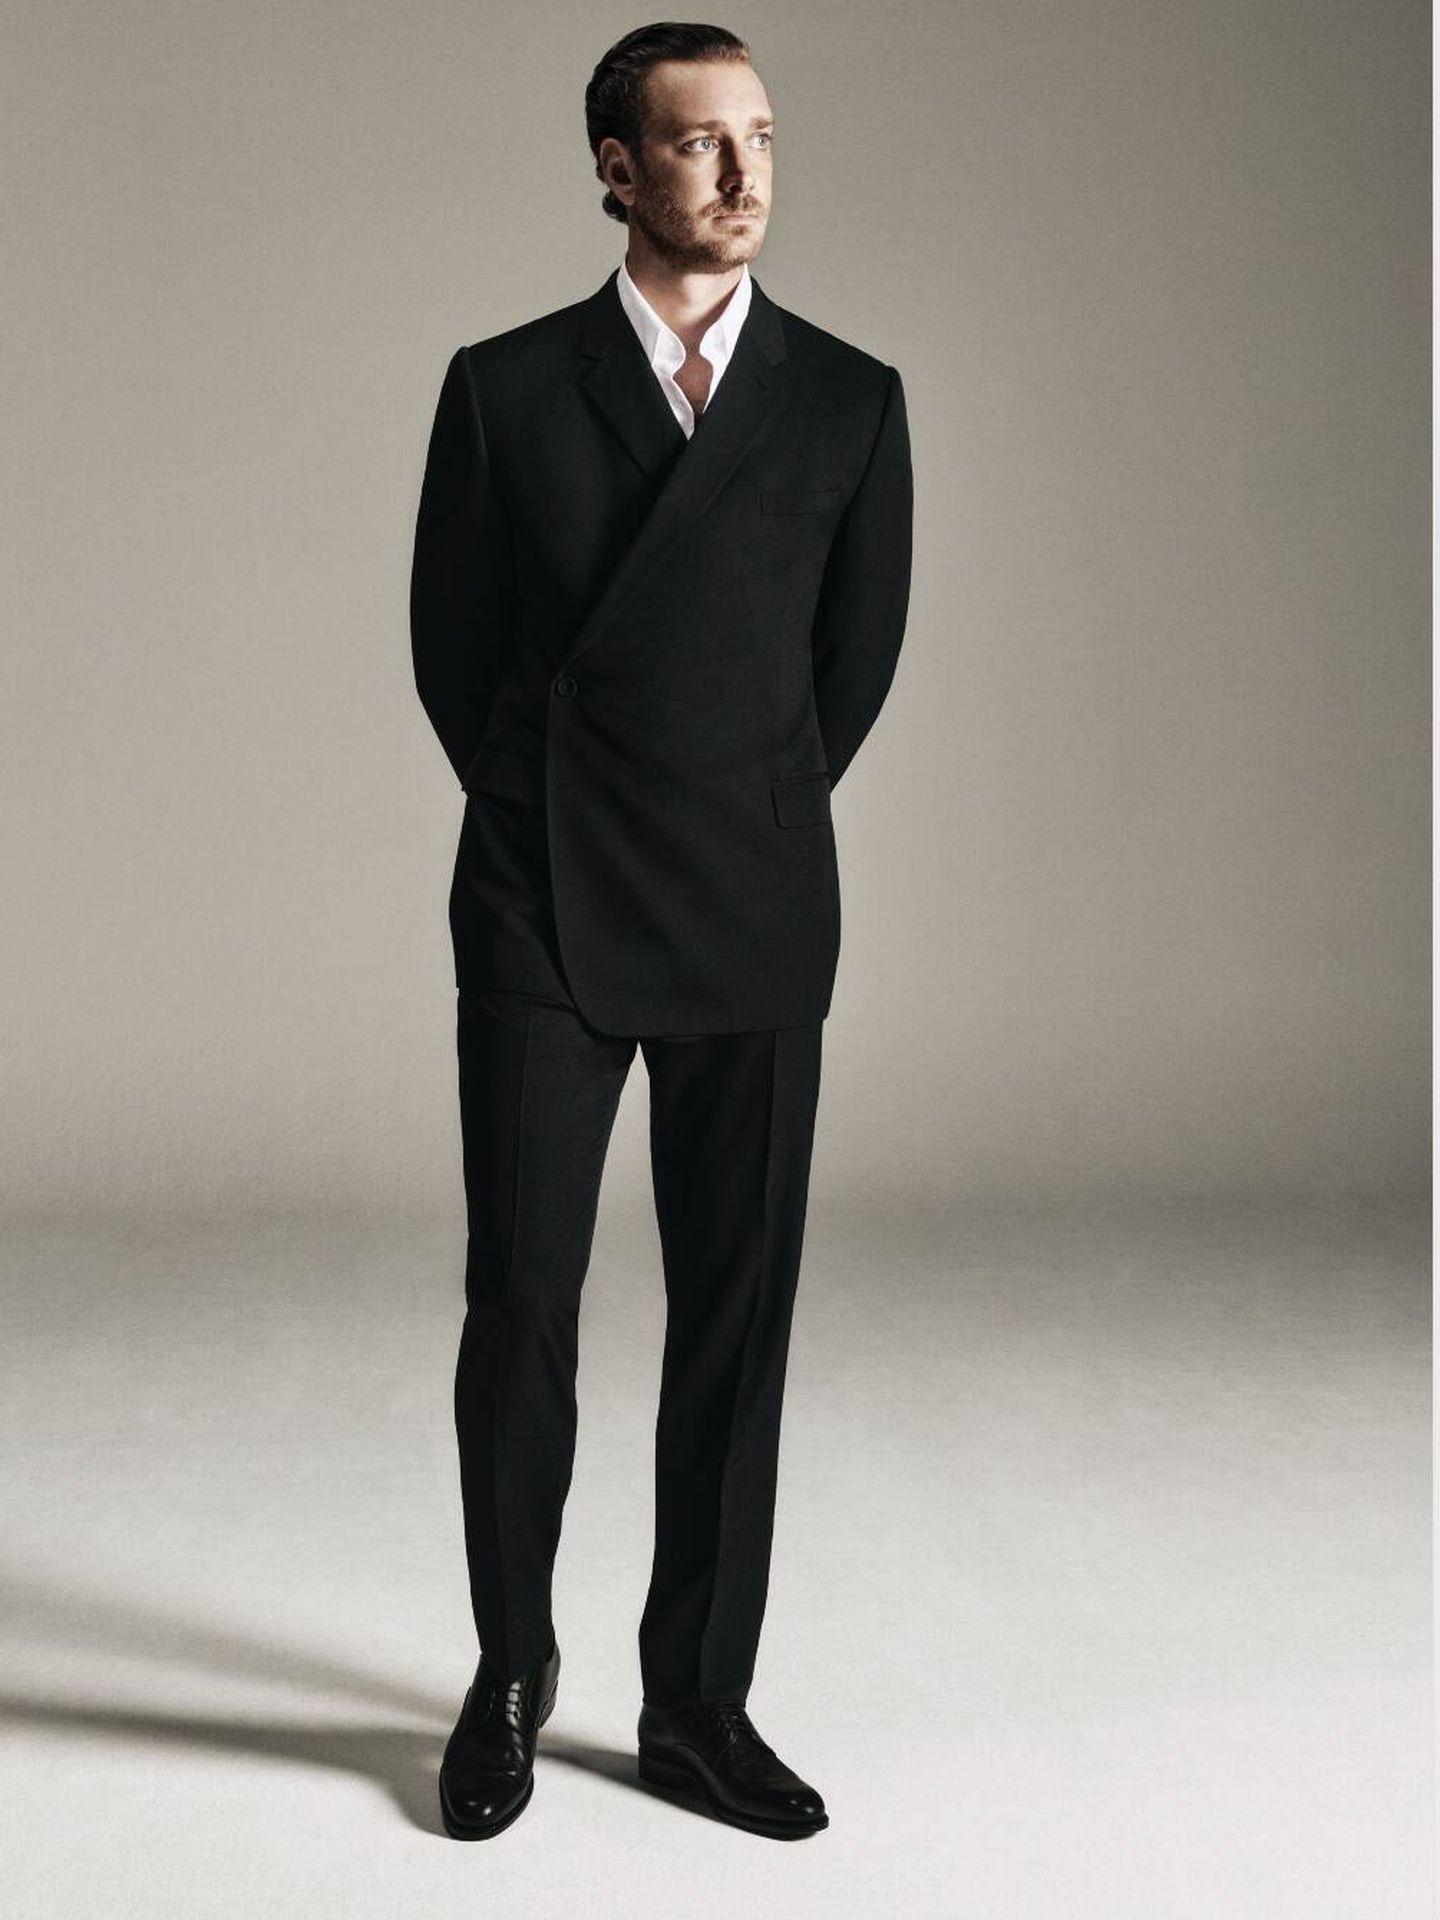 Pierre Casiraghi. (Imagen: Brett Lloyd para Dior)